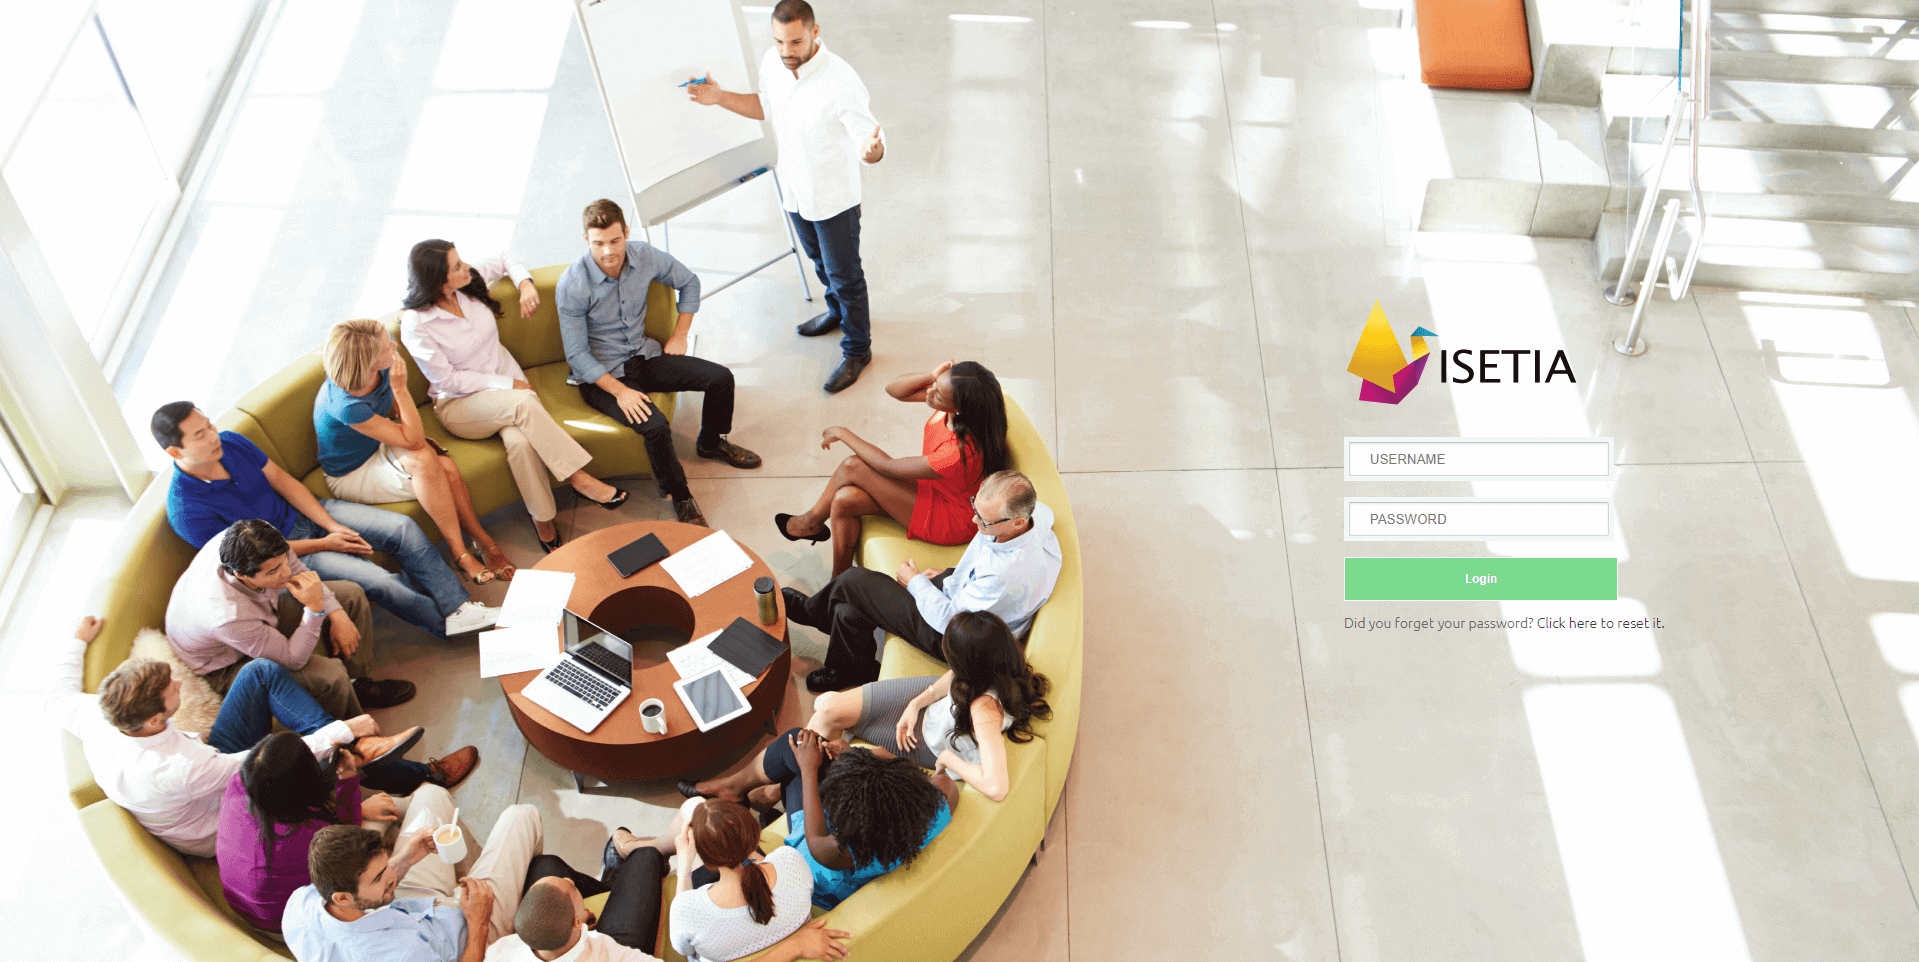 Review ISETIA: Project Management Software - appvizer